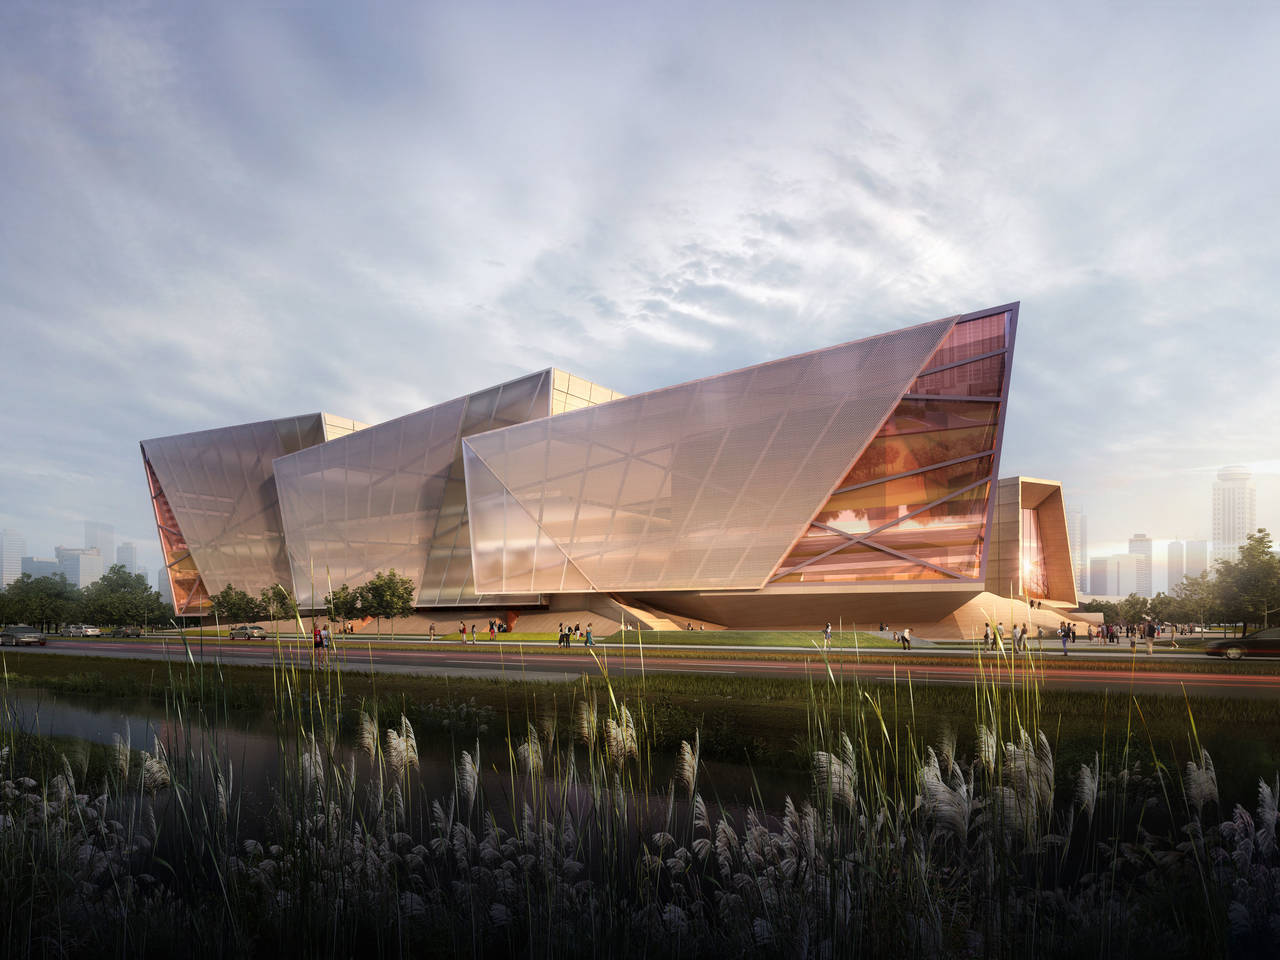 The architecture of theatres architecture essay